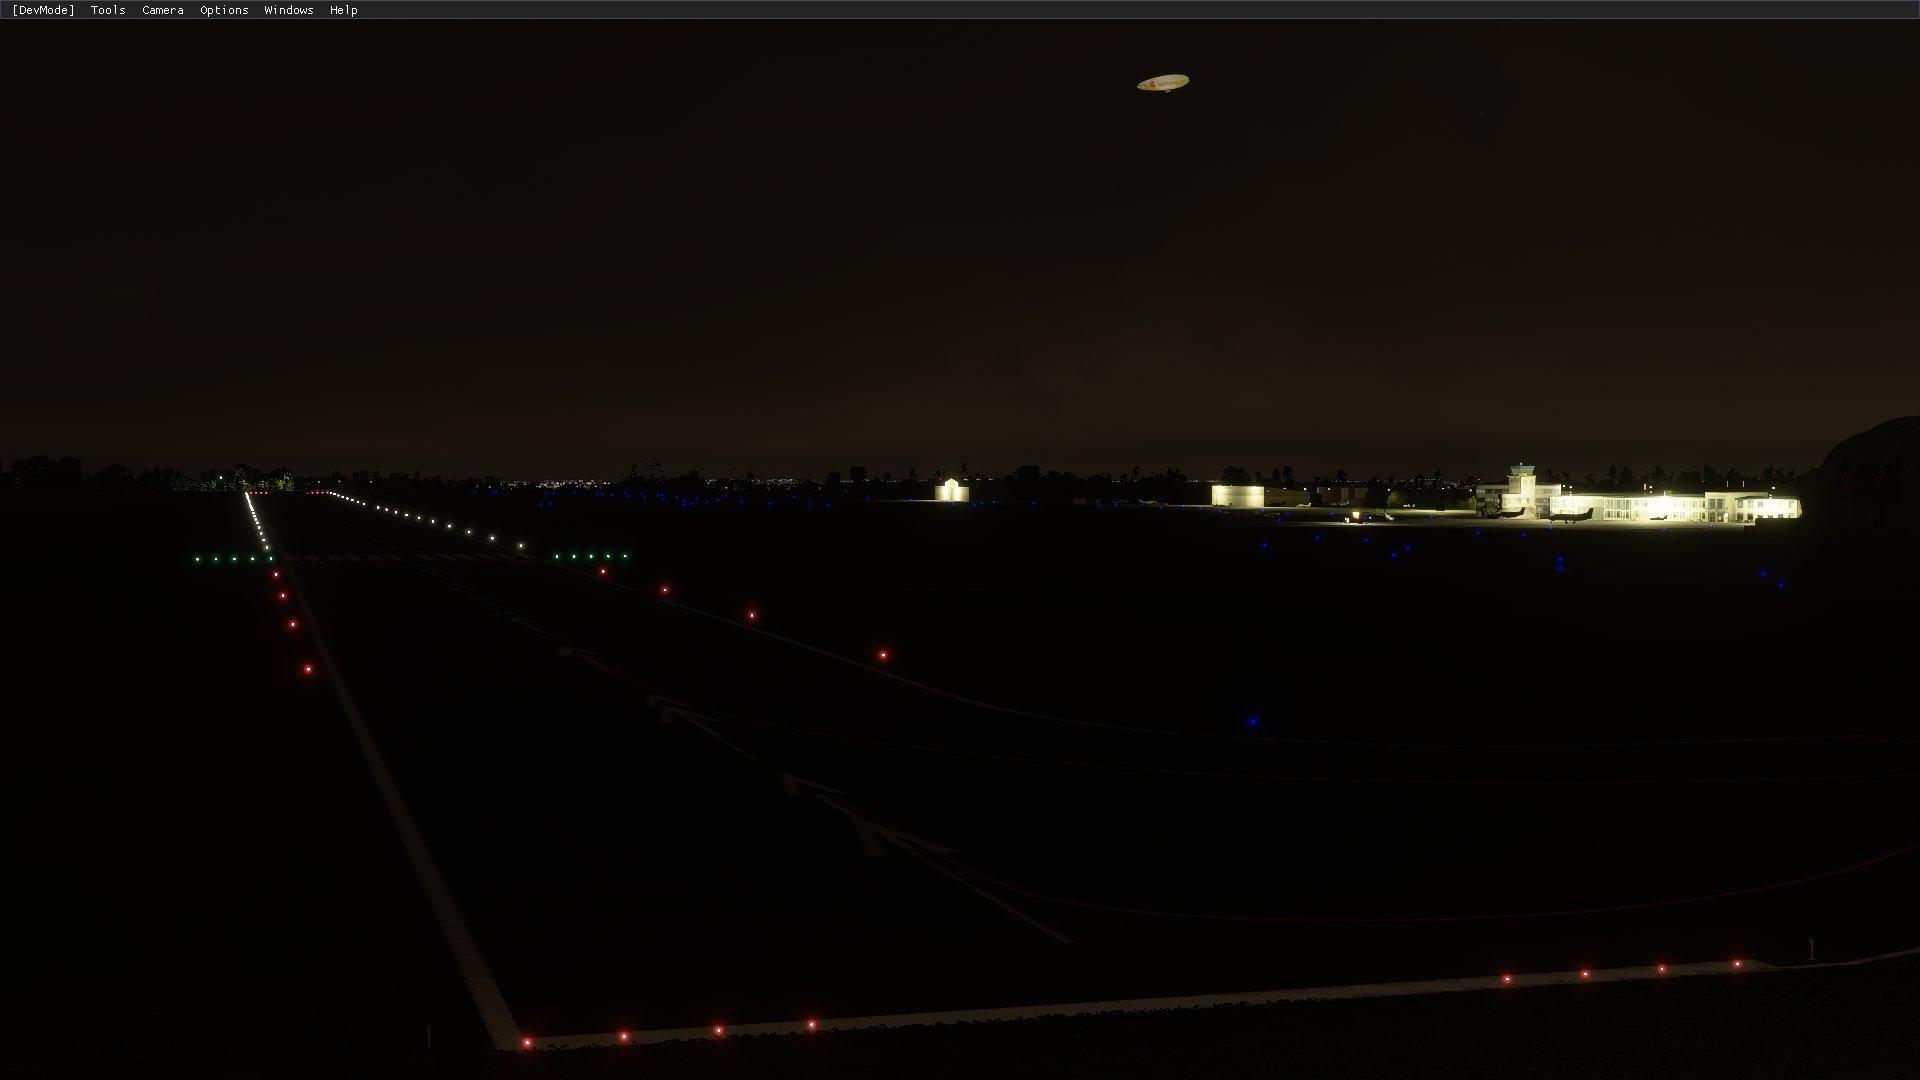 mfs_bahrometrix_edle_night_lights_1.jpg